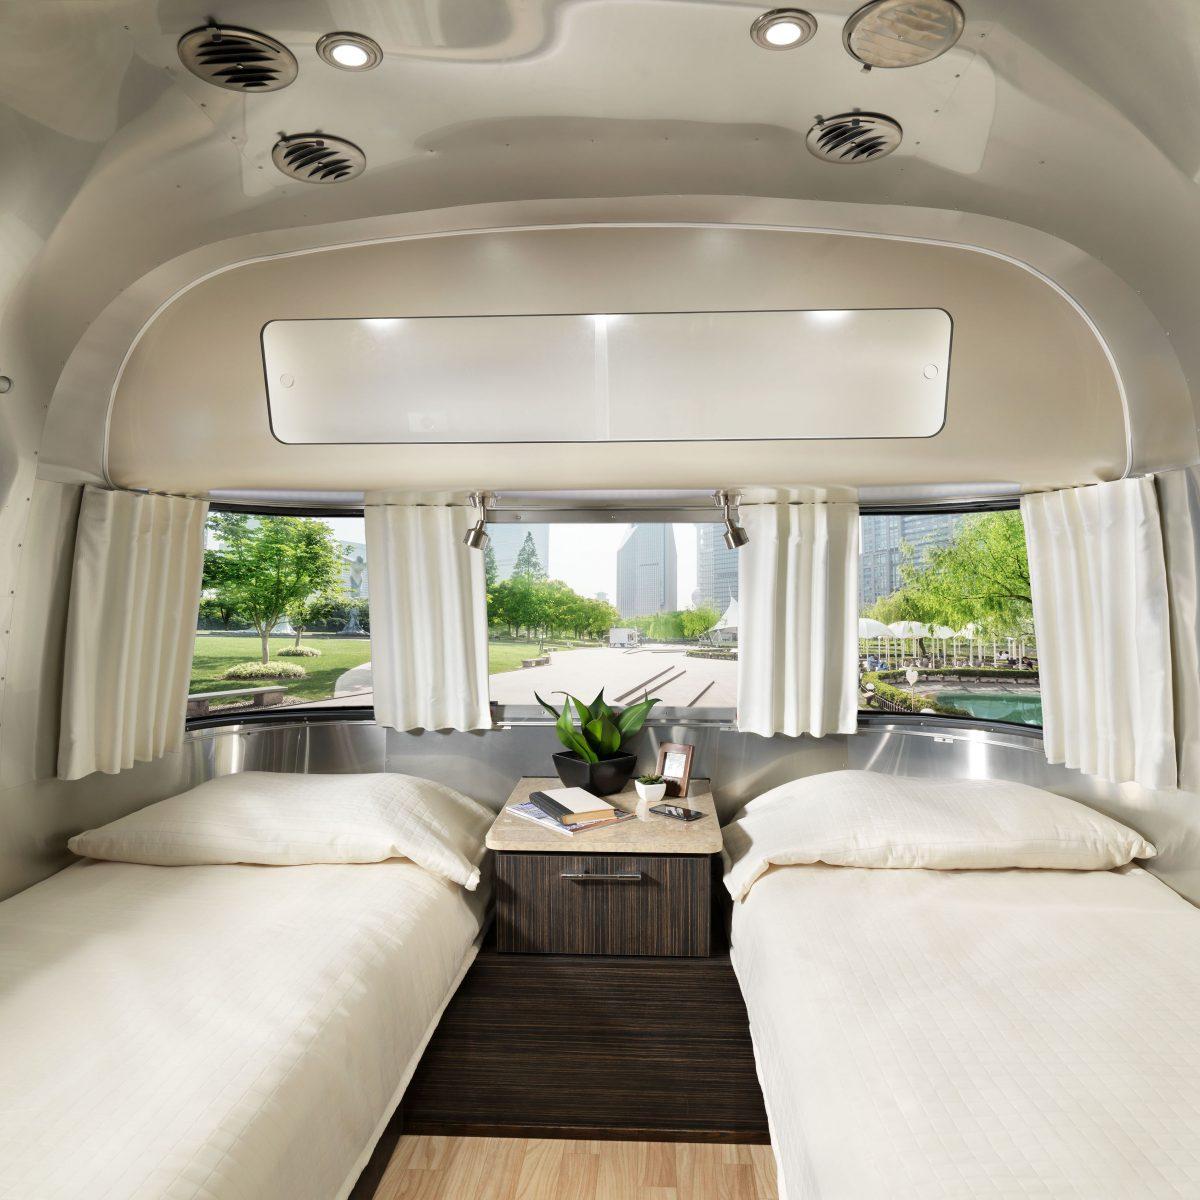 2018 28 Twin International Signature Interior Ebony Oyster _ Bedroom 2(WEB)